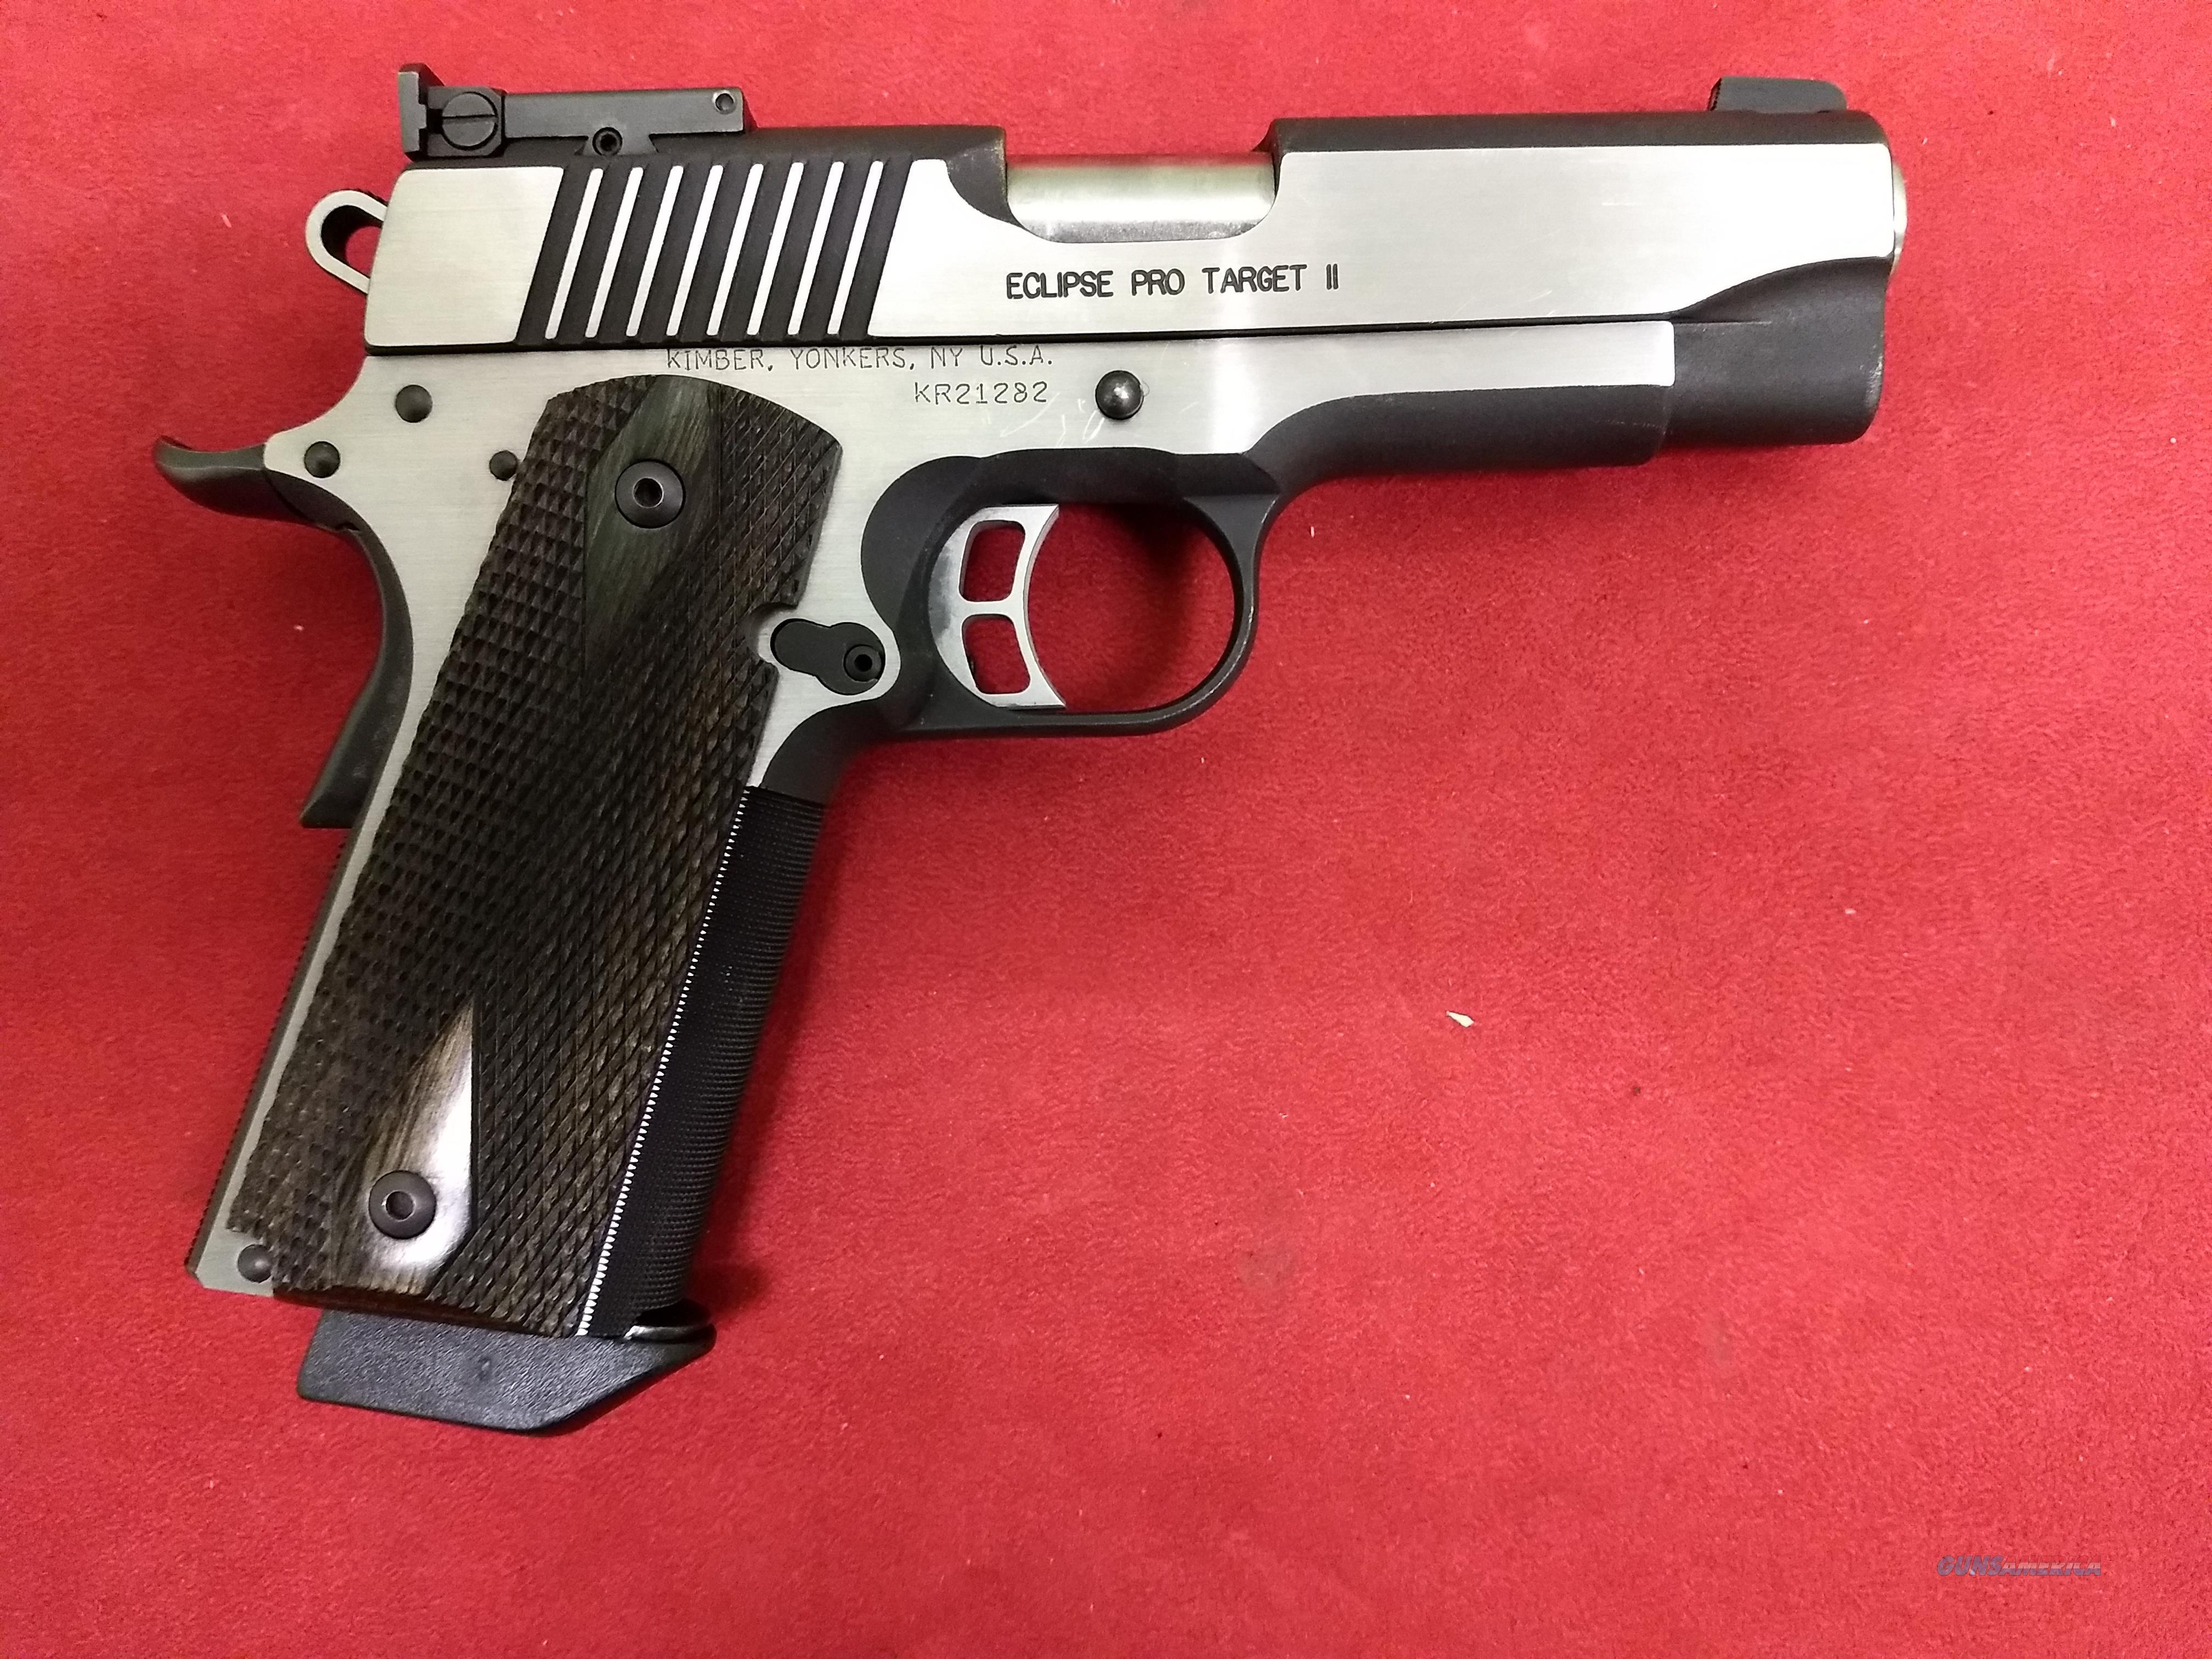 Kimber Eclipse Pro Target II, .45 ACP  Guns > Pistols > Kimber of America Pistols > 1911